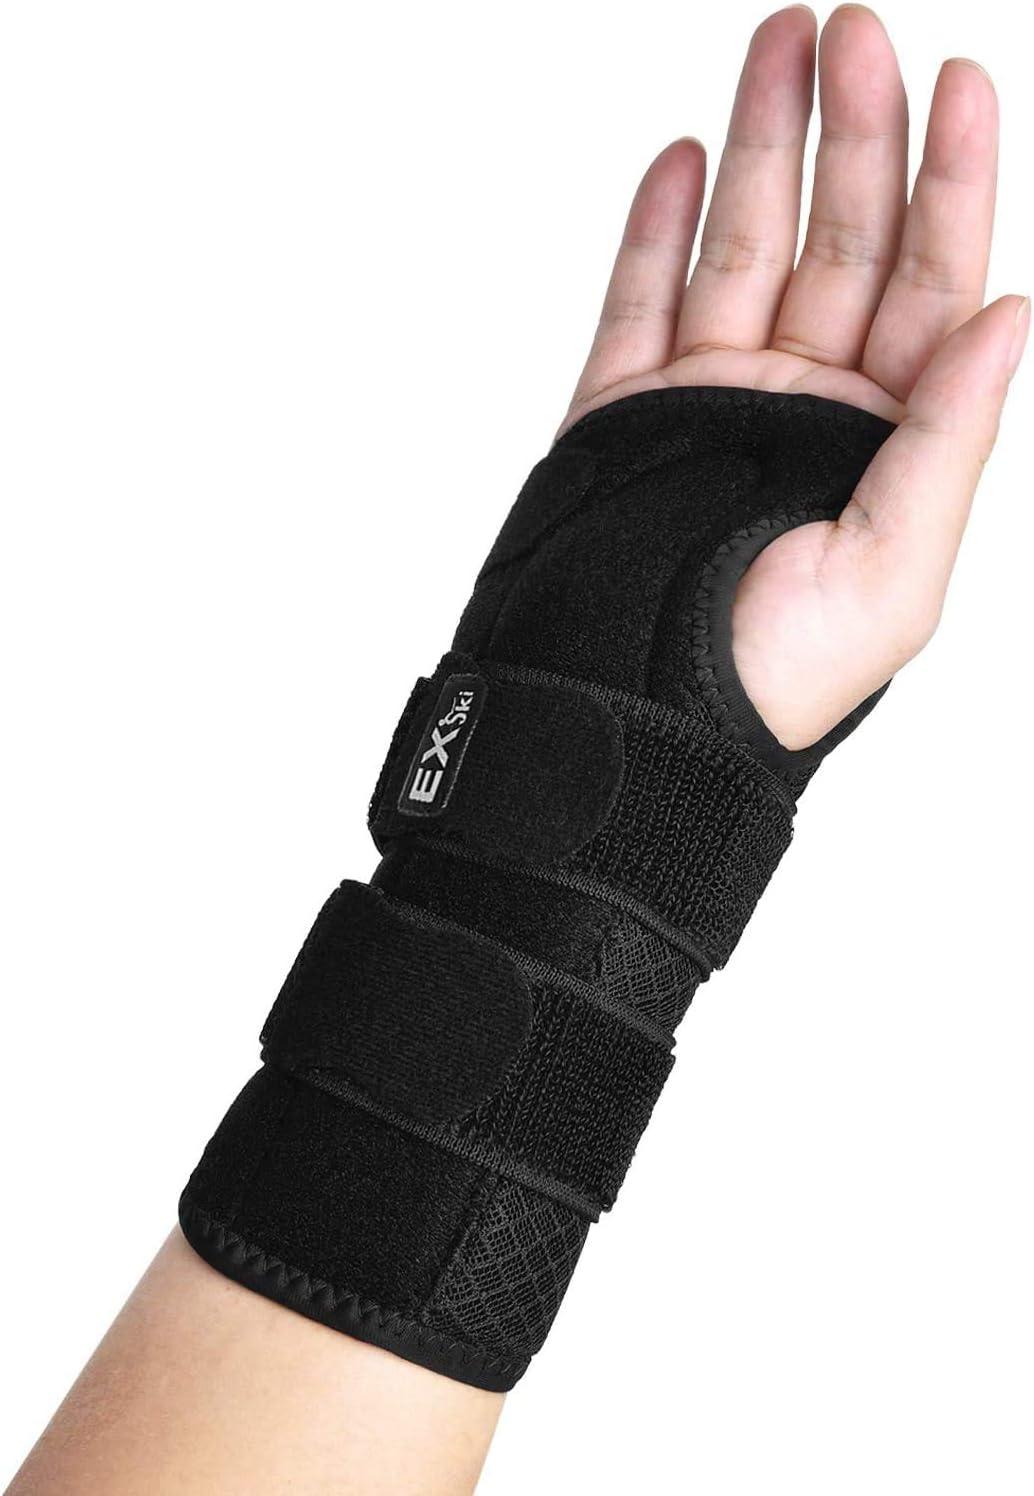 EXski Carpal Tunnel Wrist Brace (Single), Night Wrist Support Brace with Double Splints Adjustable Straps Right Left Hand